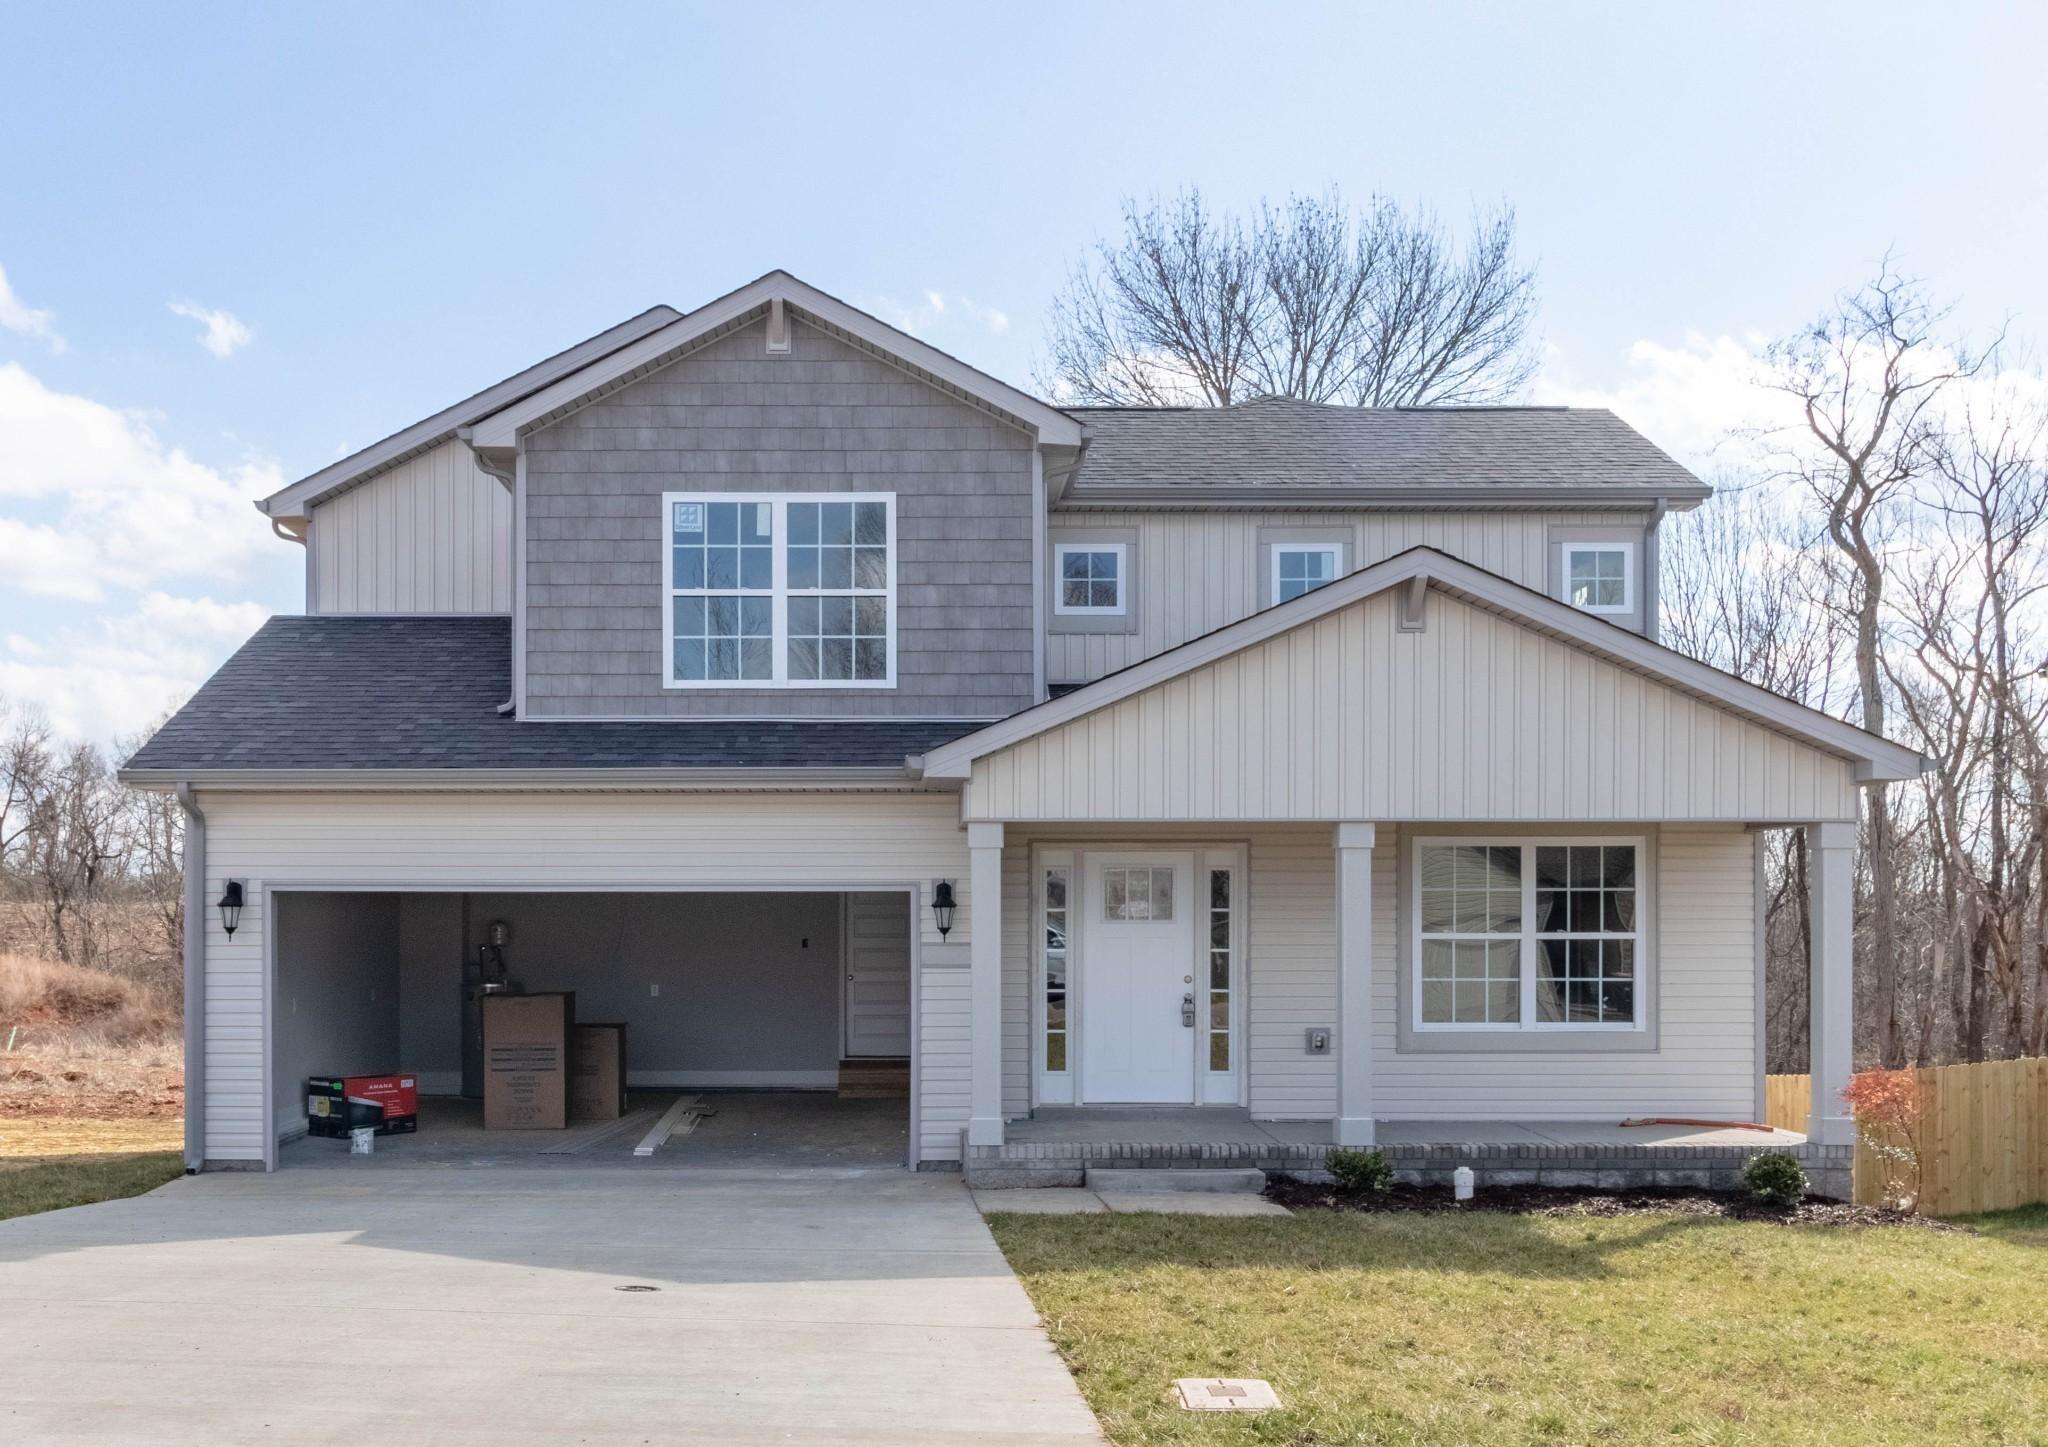 1851 Rains Rd, Clarksville, TN 37042 - Clarksville, TN real estate listing